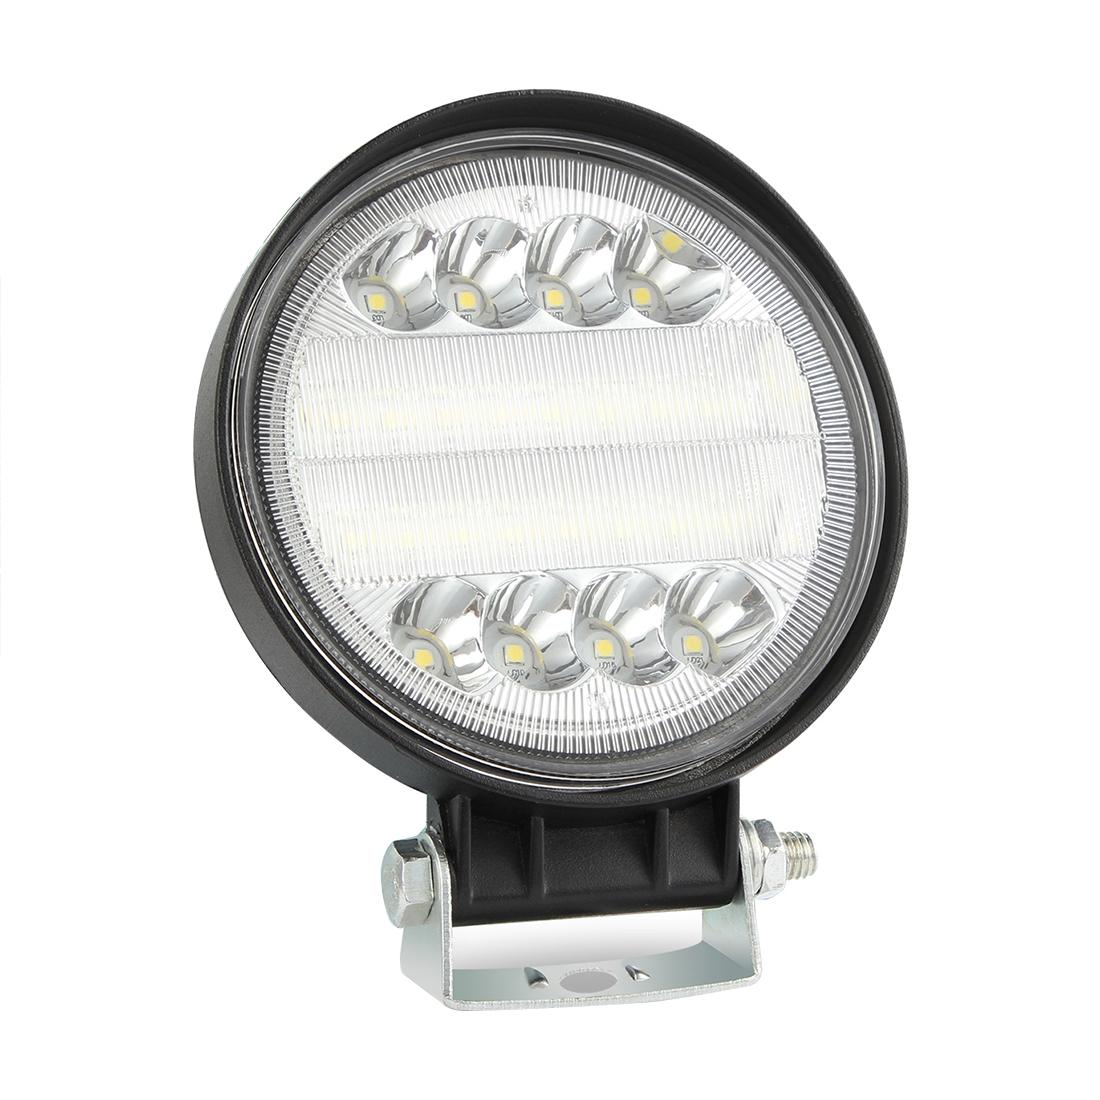 Spot Lights Flood Lights: 2 PCS 4 Inch 15W Spot / Flood Light White Light Round